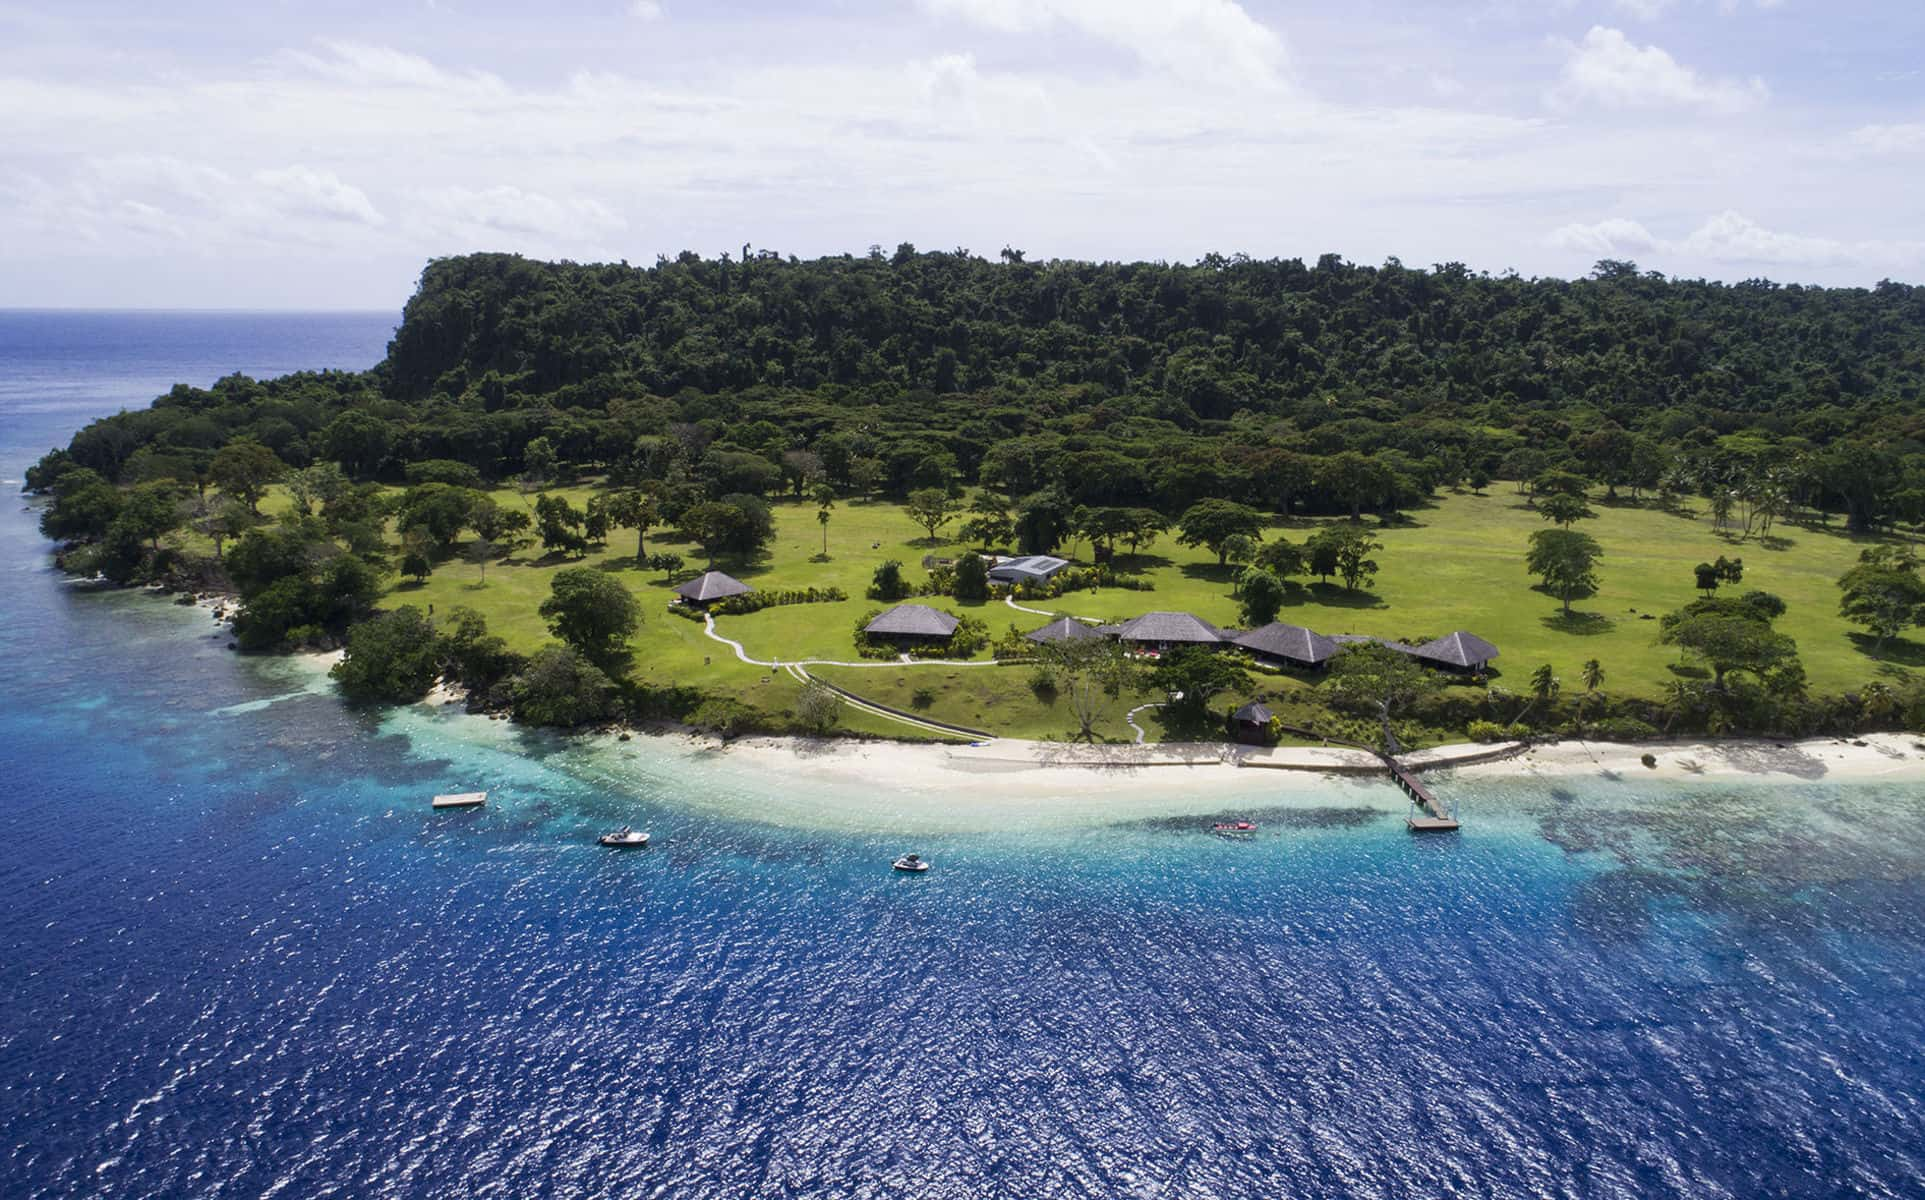 Lataro Island